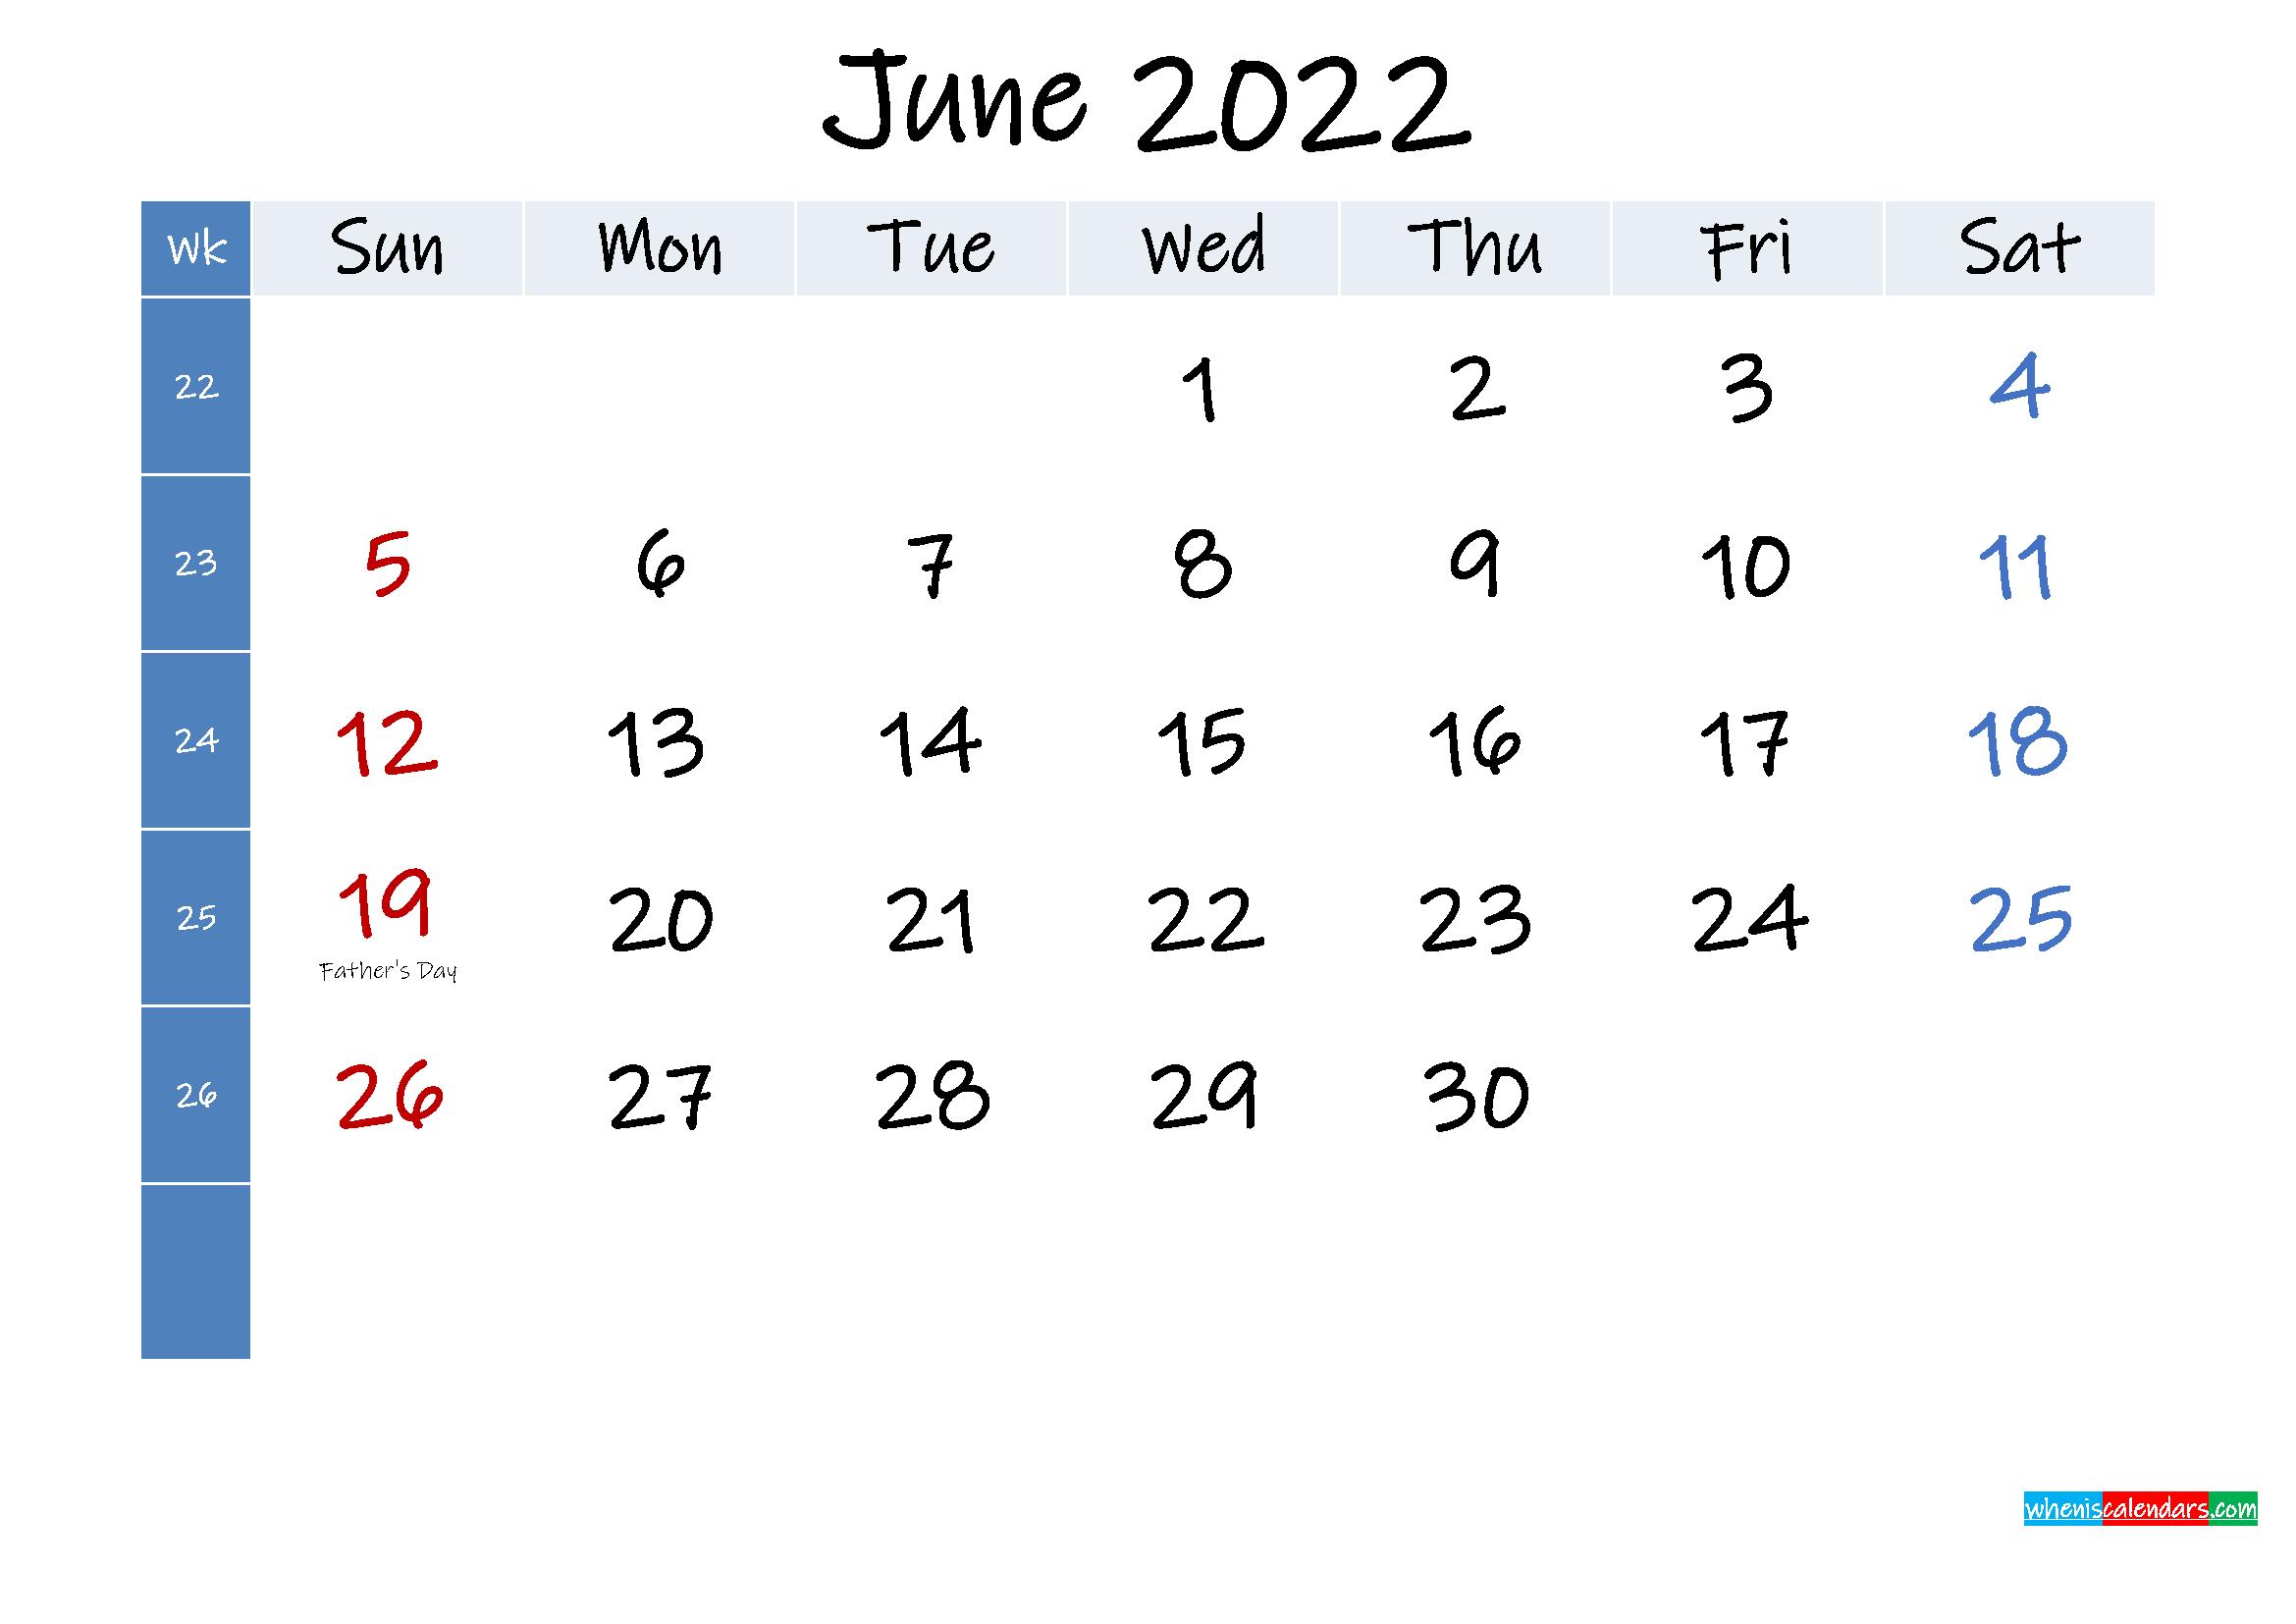 June 2022 Free Printable Calendar with Holidays